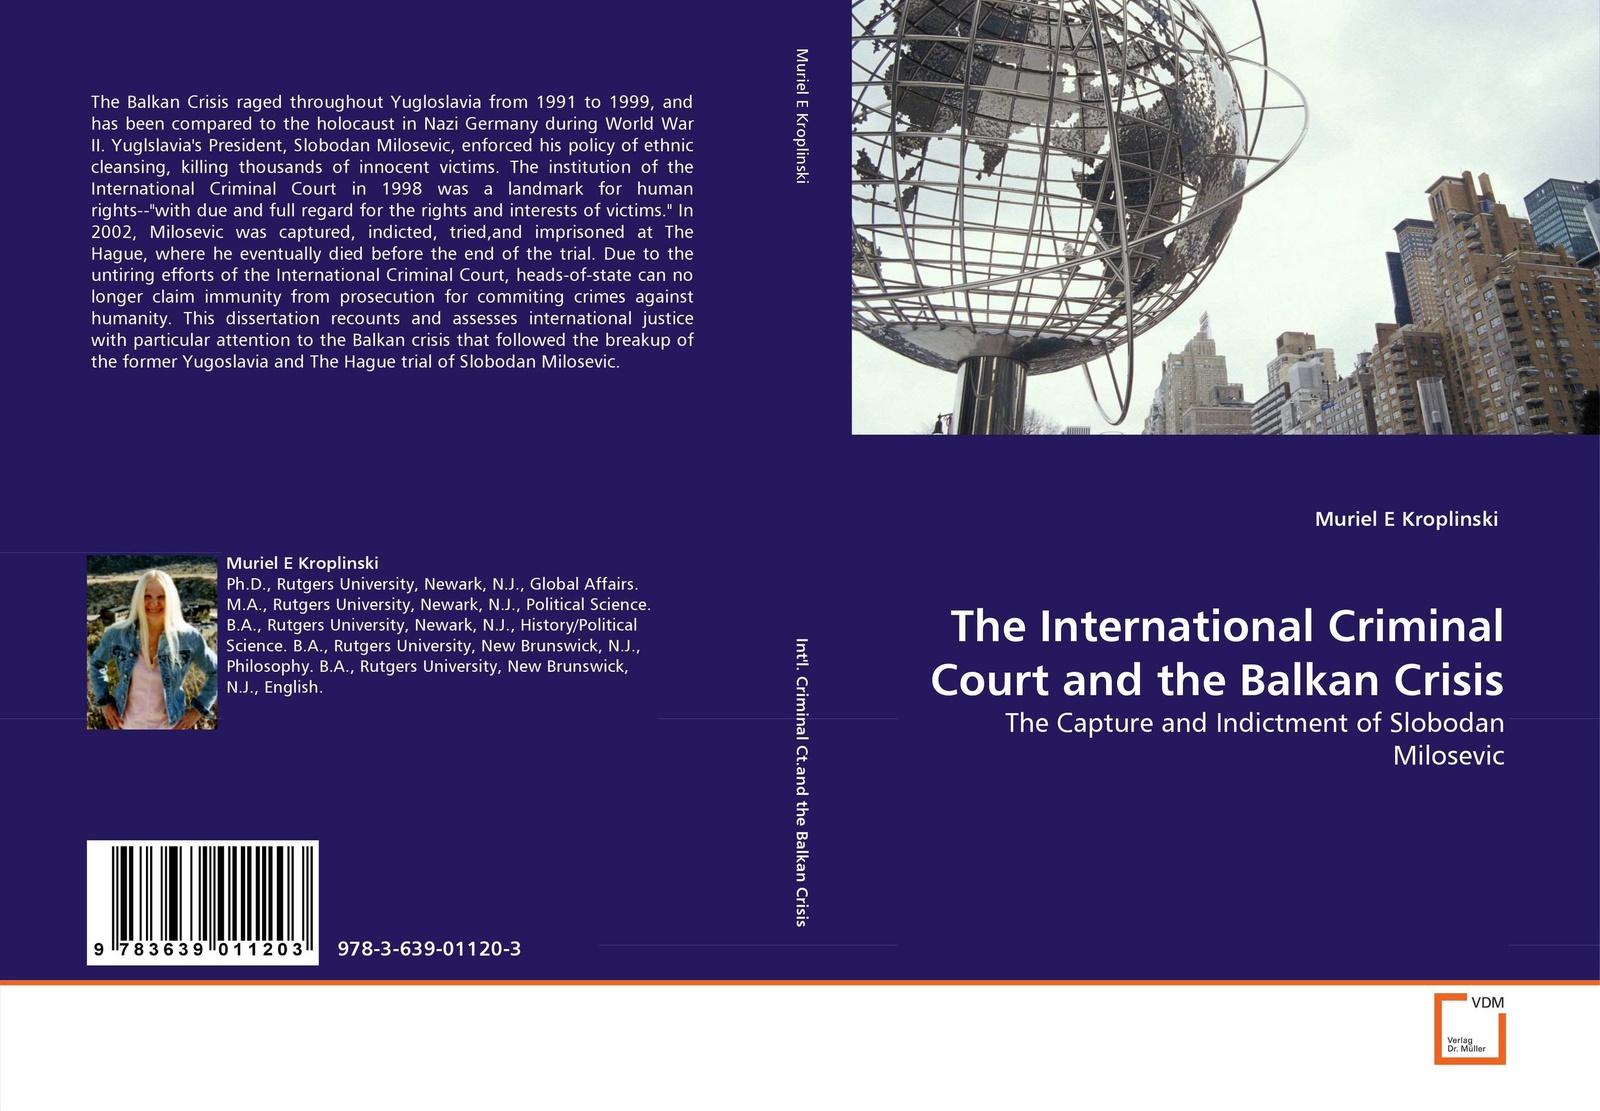 Muriel E Kroplinski The International Criminal Court and the Balkan Crisis towards a decade of the international criminal court in africa